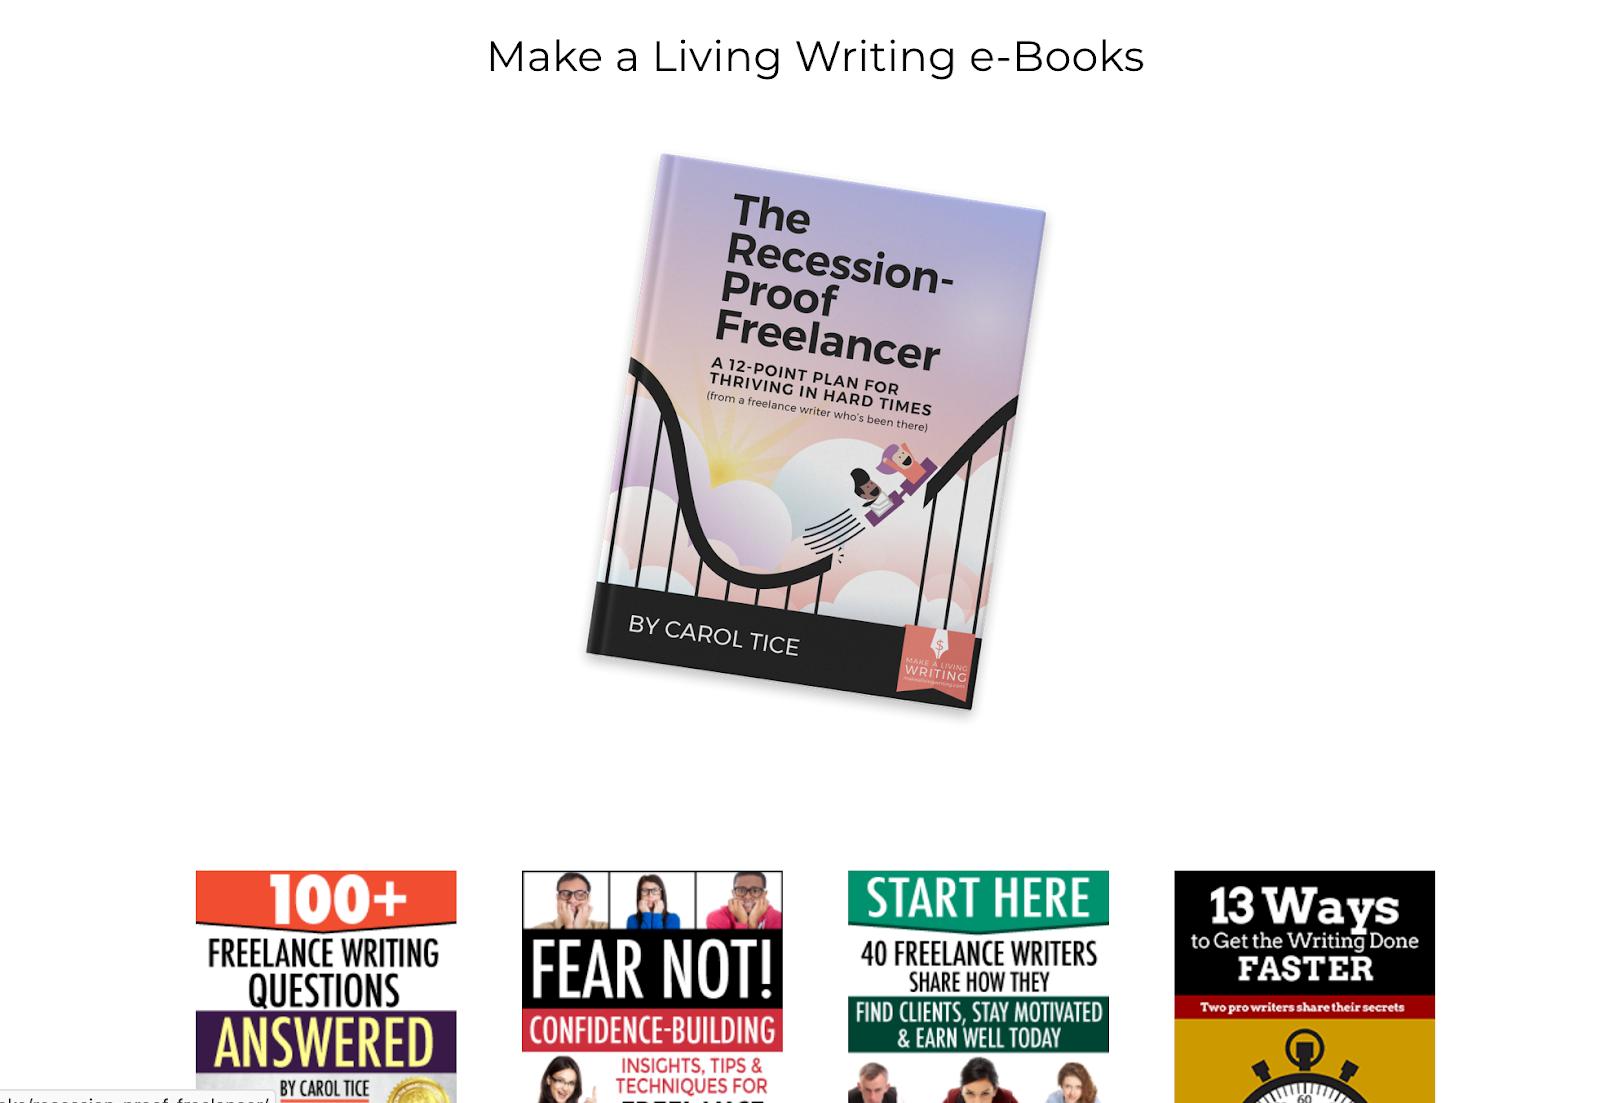 carol tice free ebooks on writing